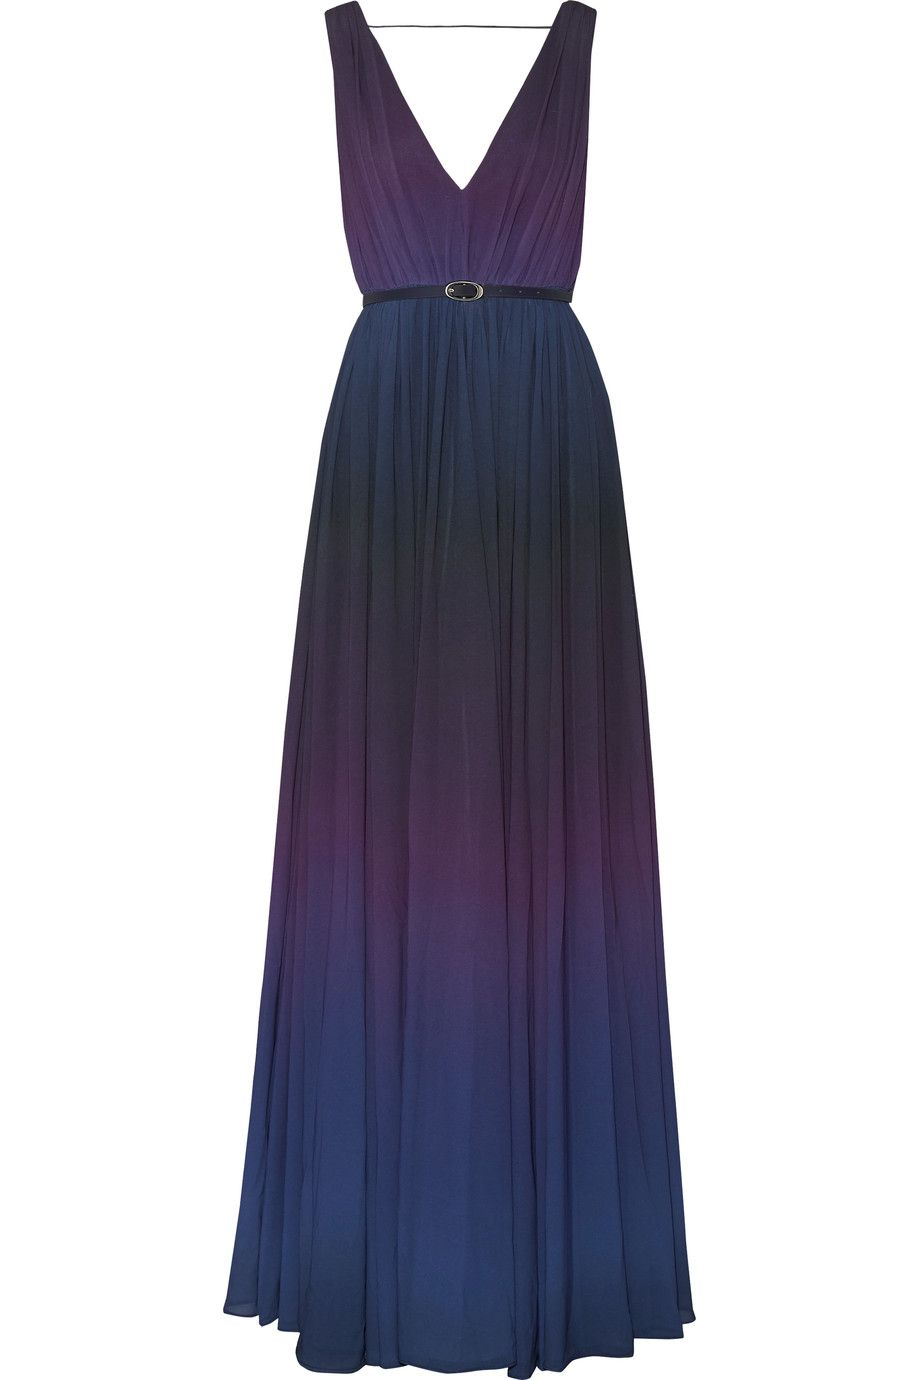 Shop on-sale Raoul Sarina pleated dégradé chiffon gown. Browse other  discount designer Dresses